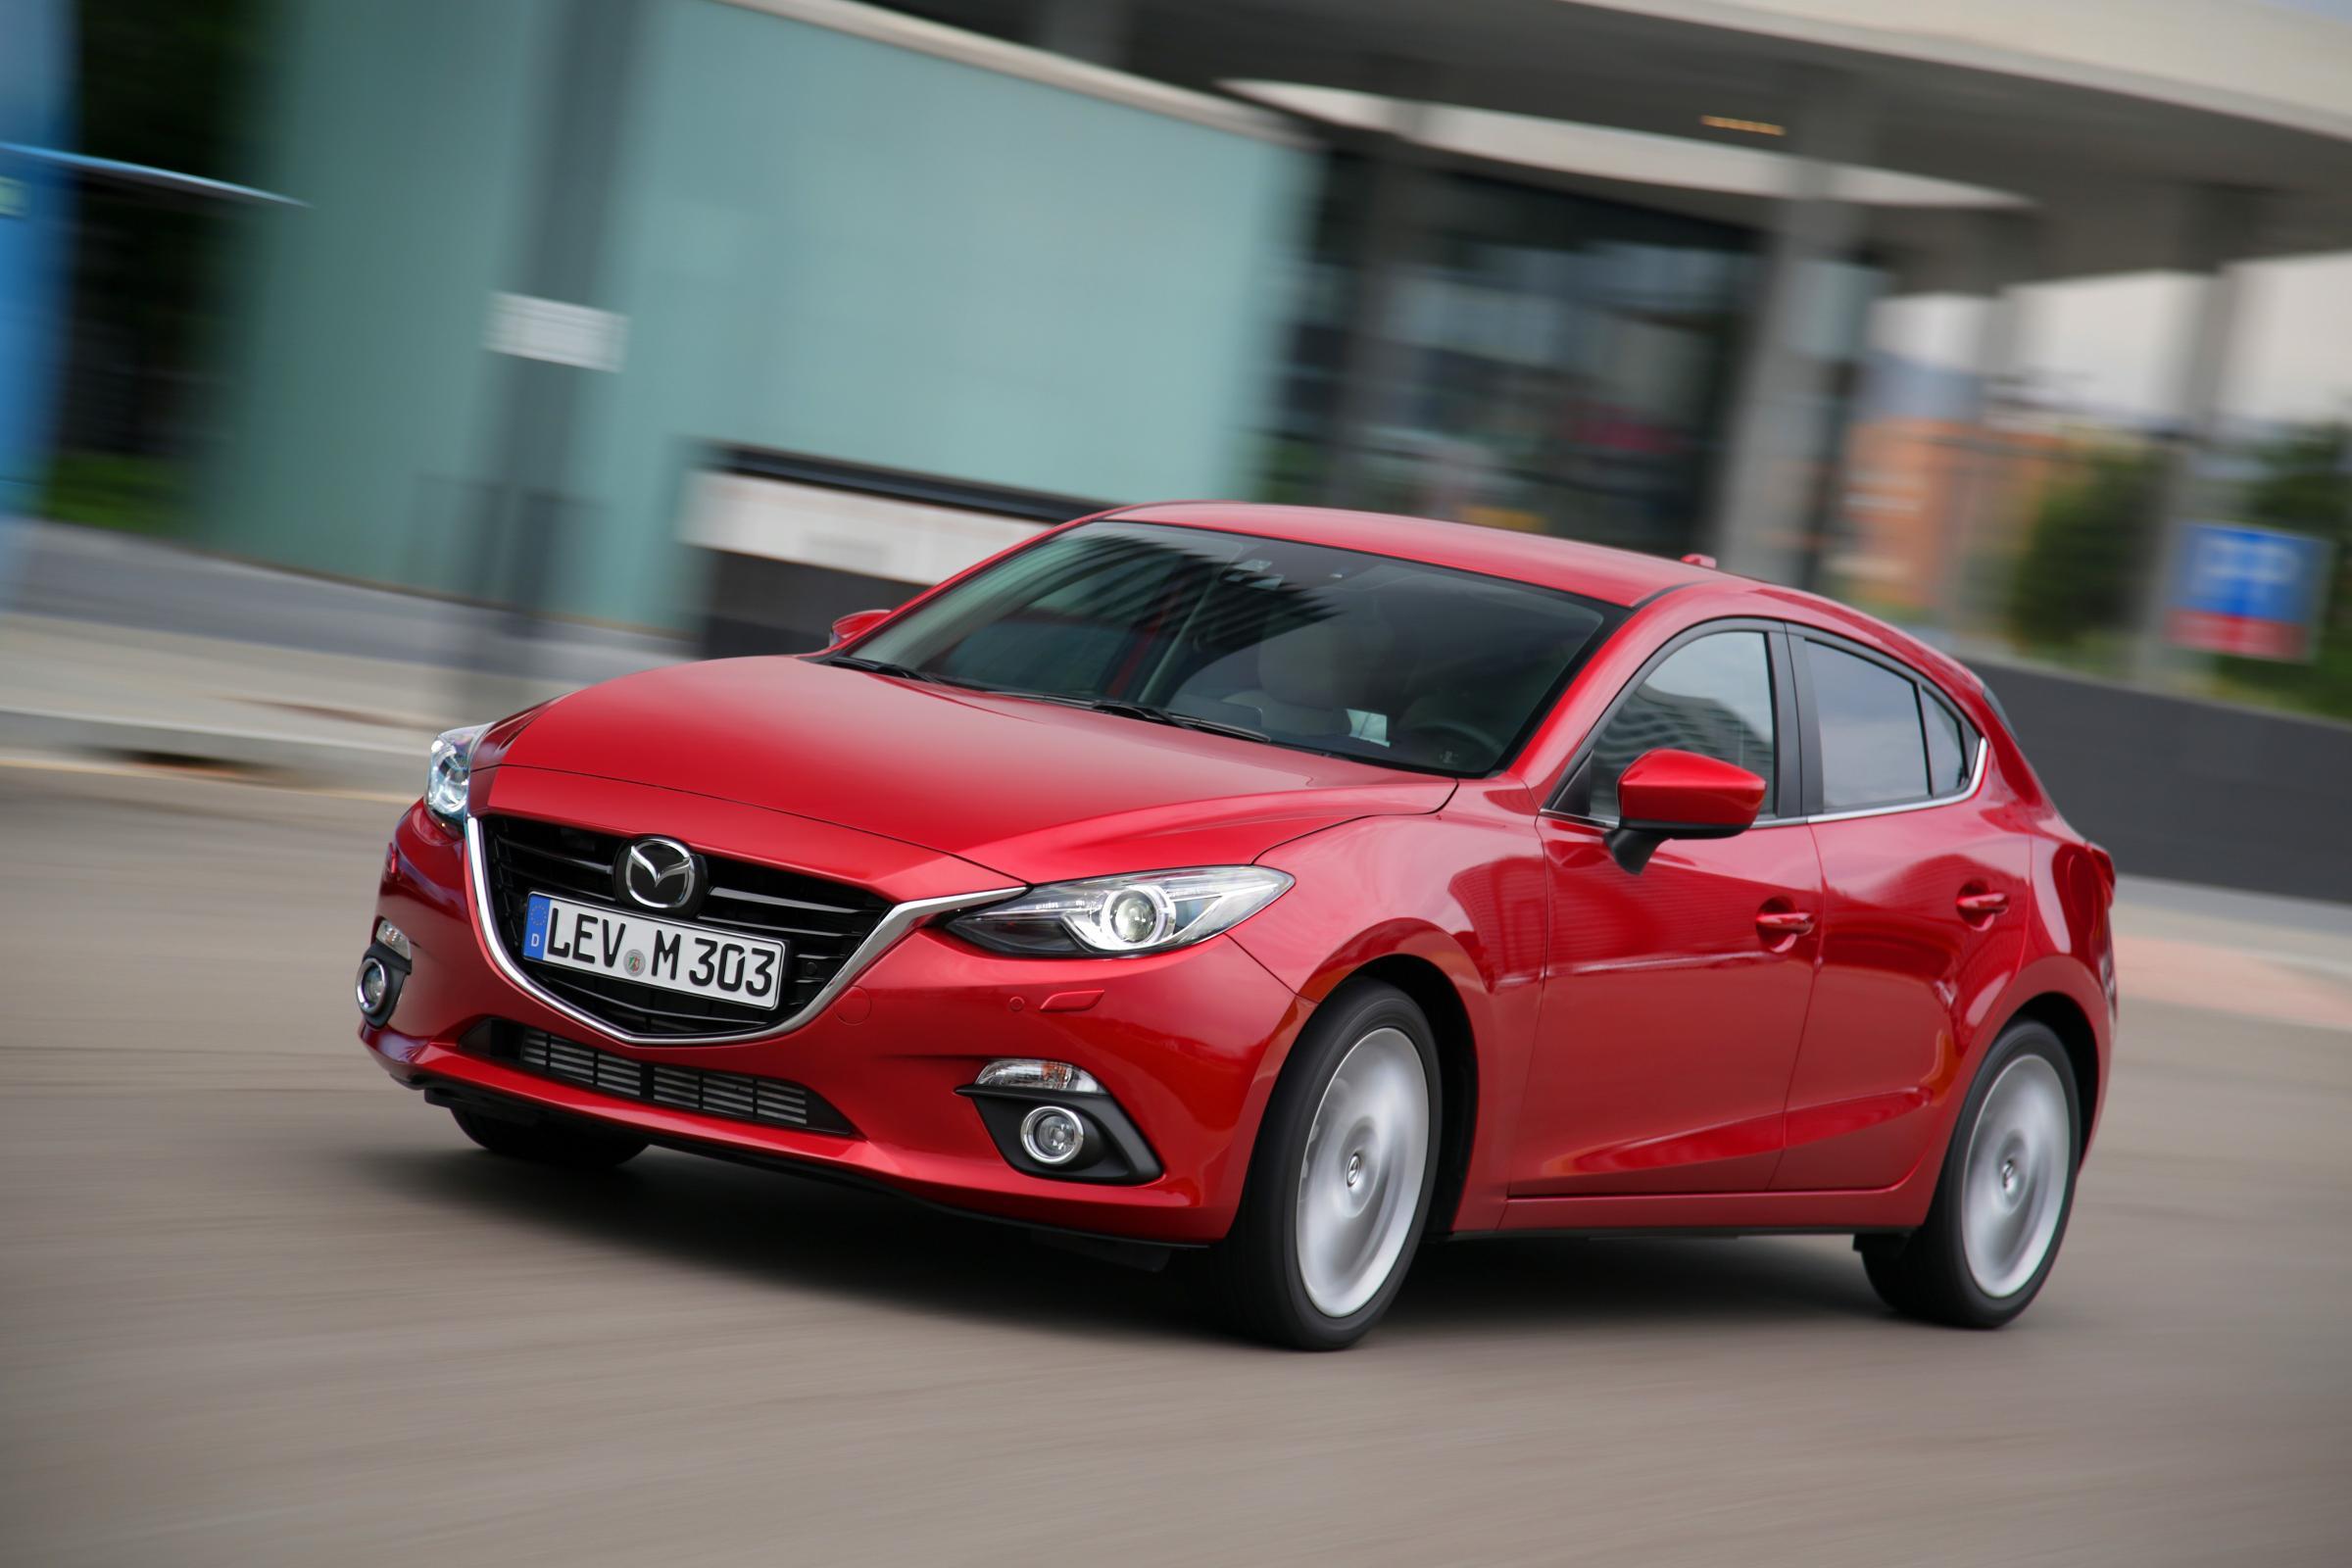 New Mazda 3 For Frankfurt, Unconfirmed For SA: Latest News – Surf4cars